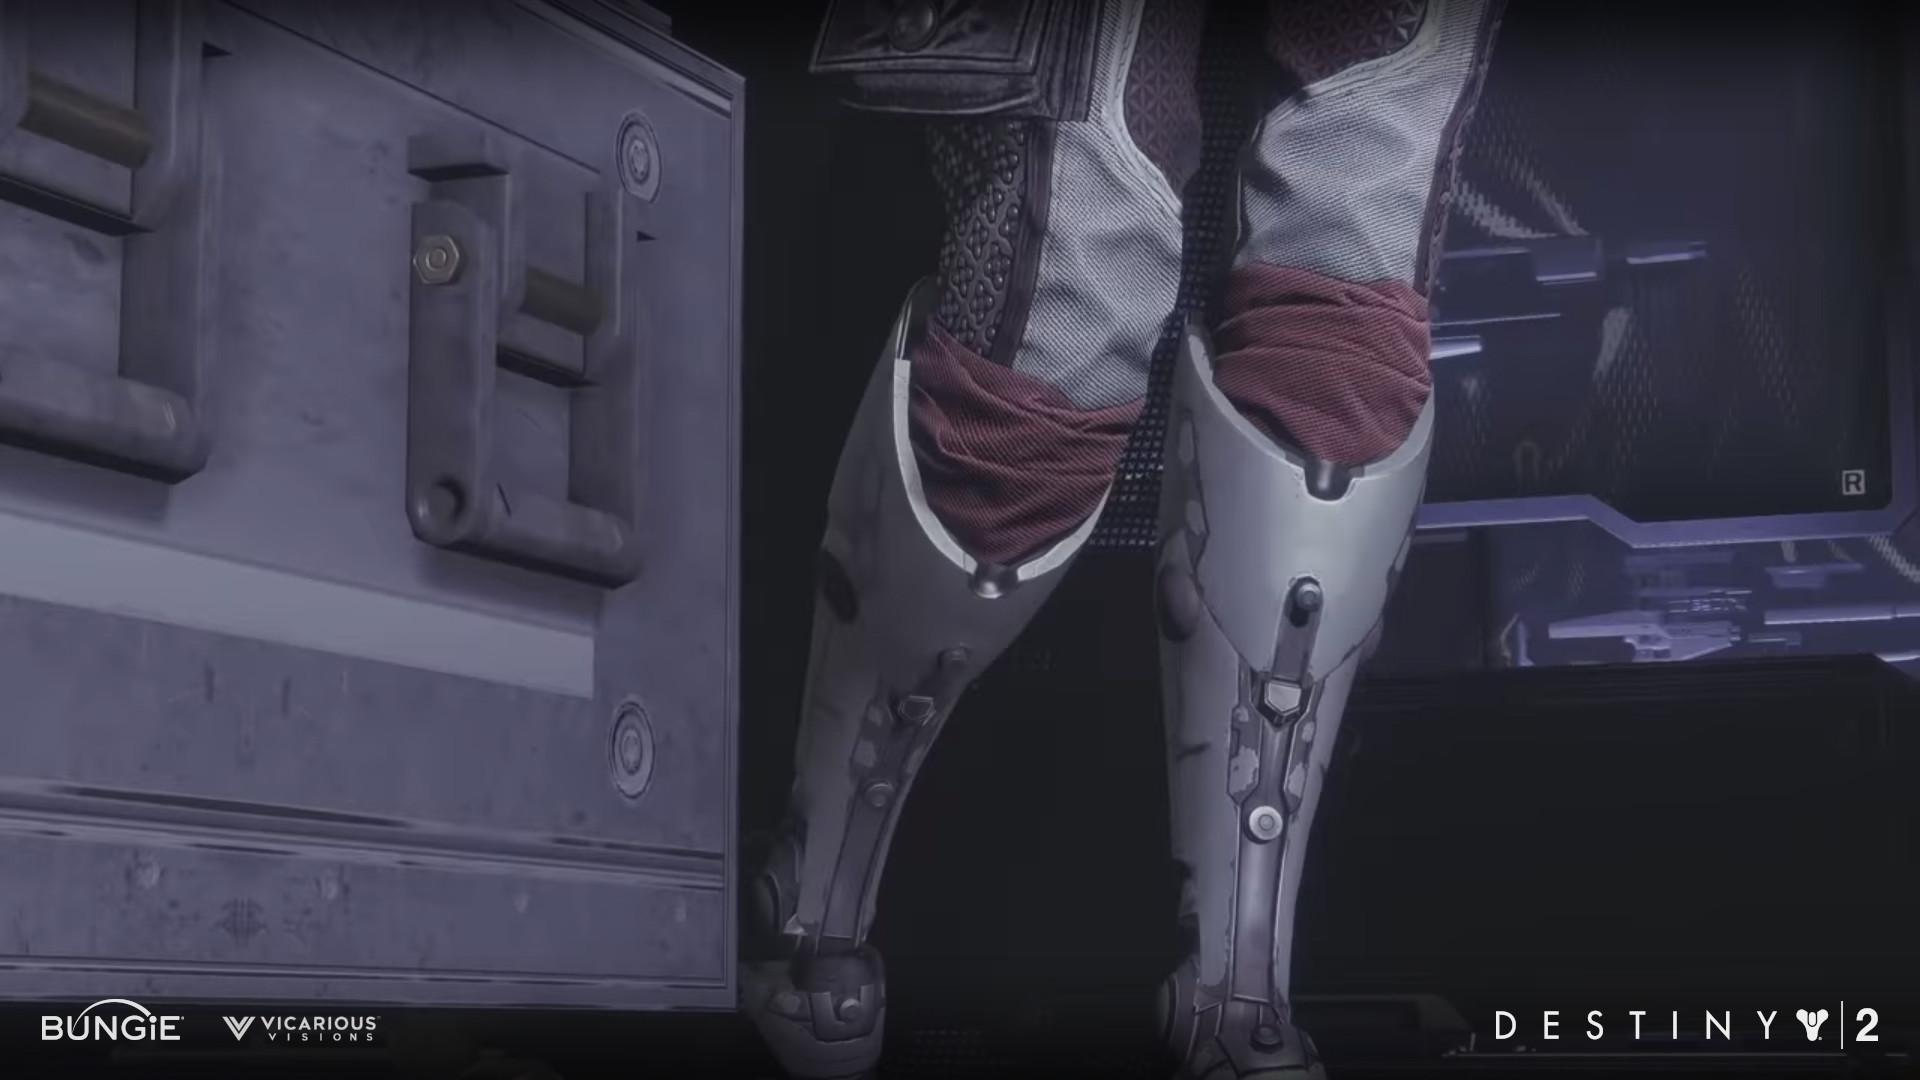 Chx hamlet ada legs chadhamlet